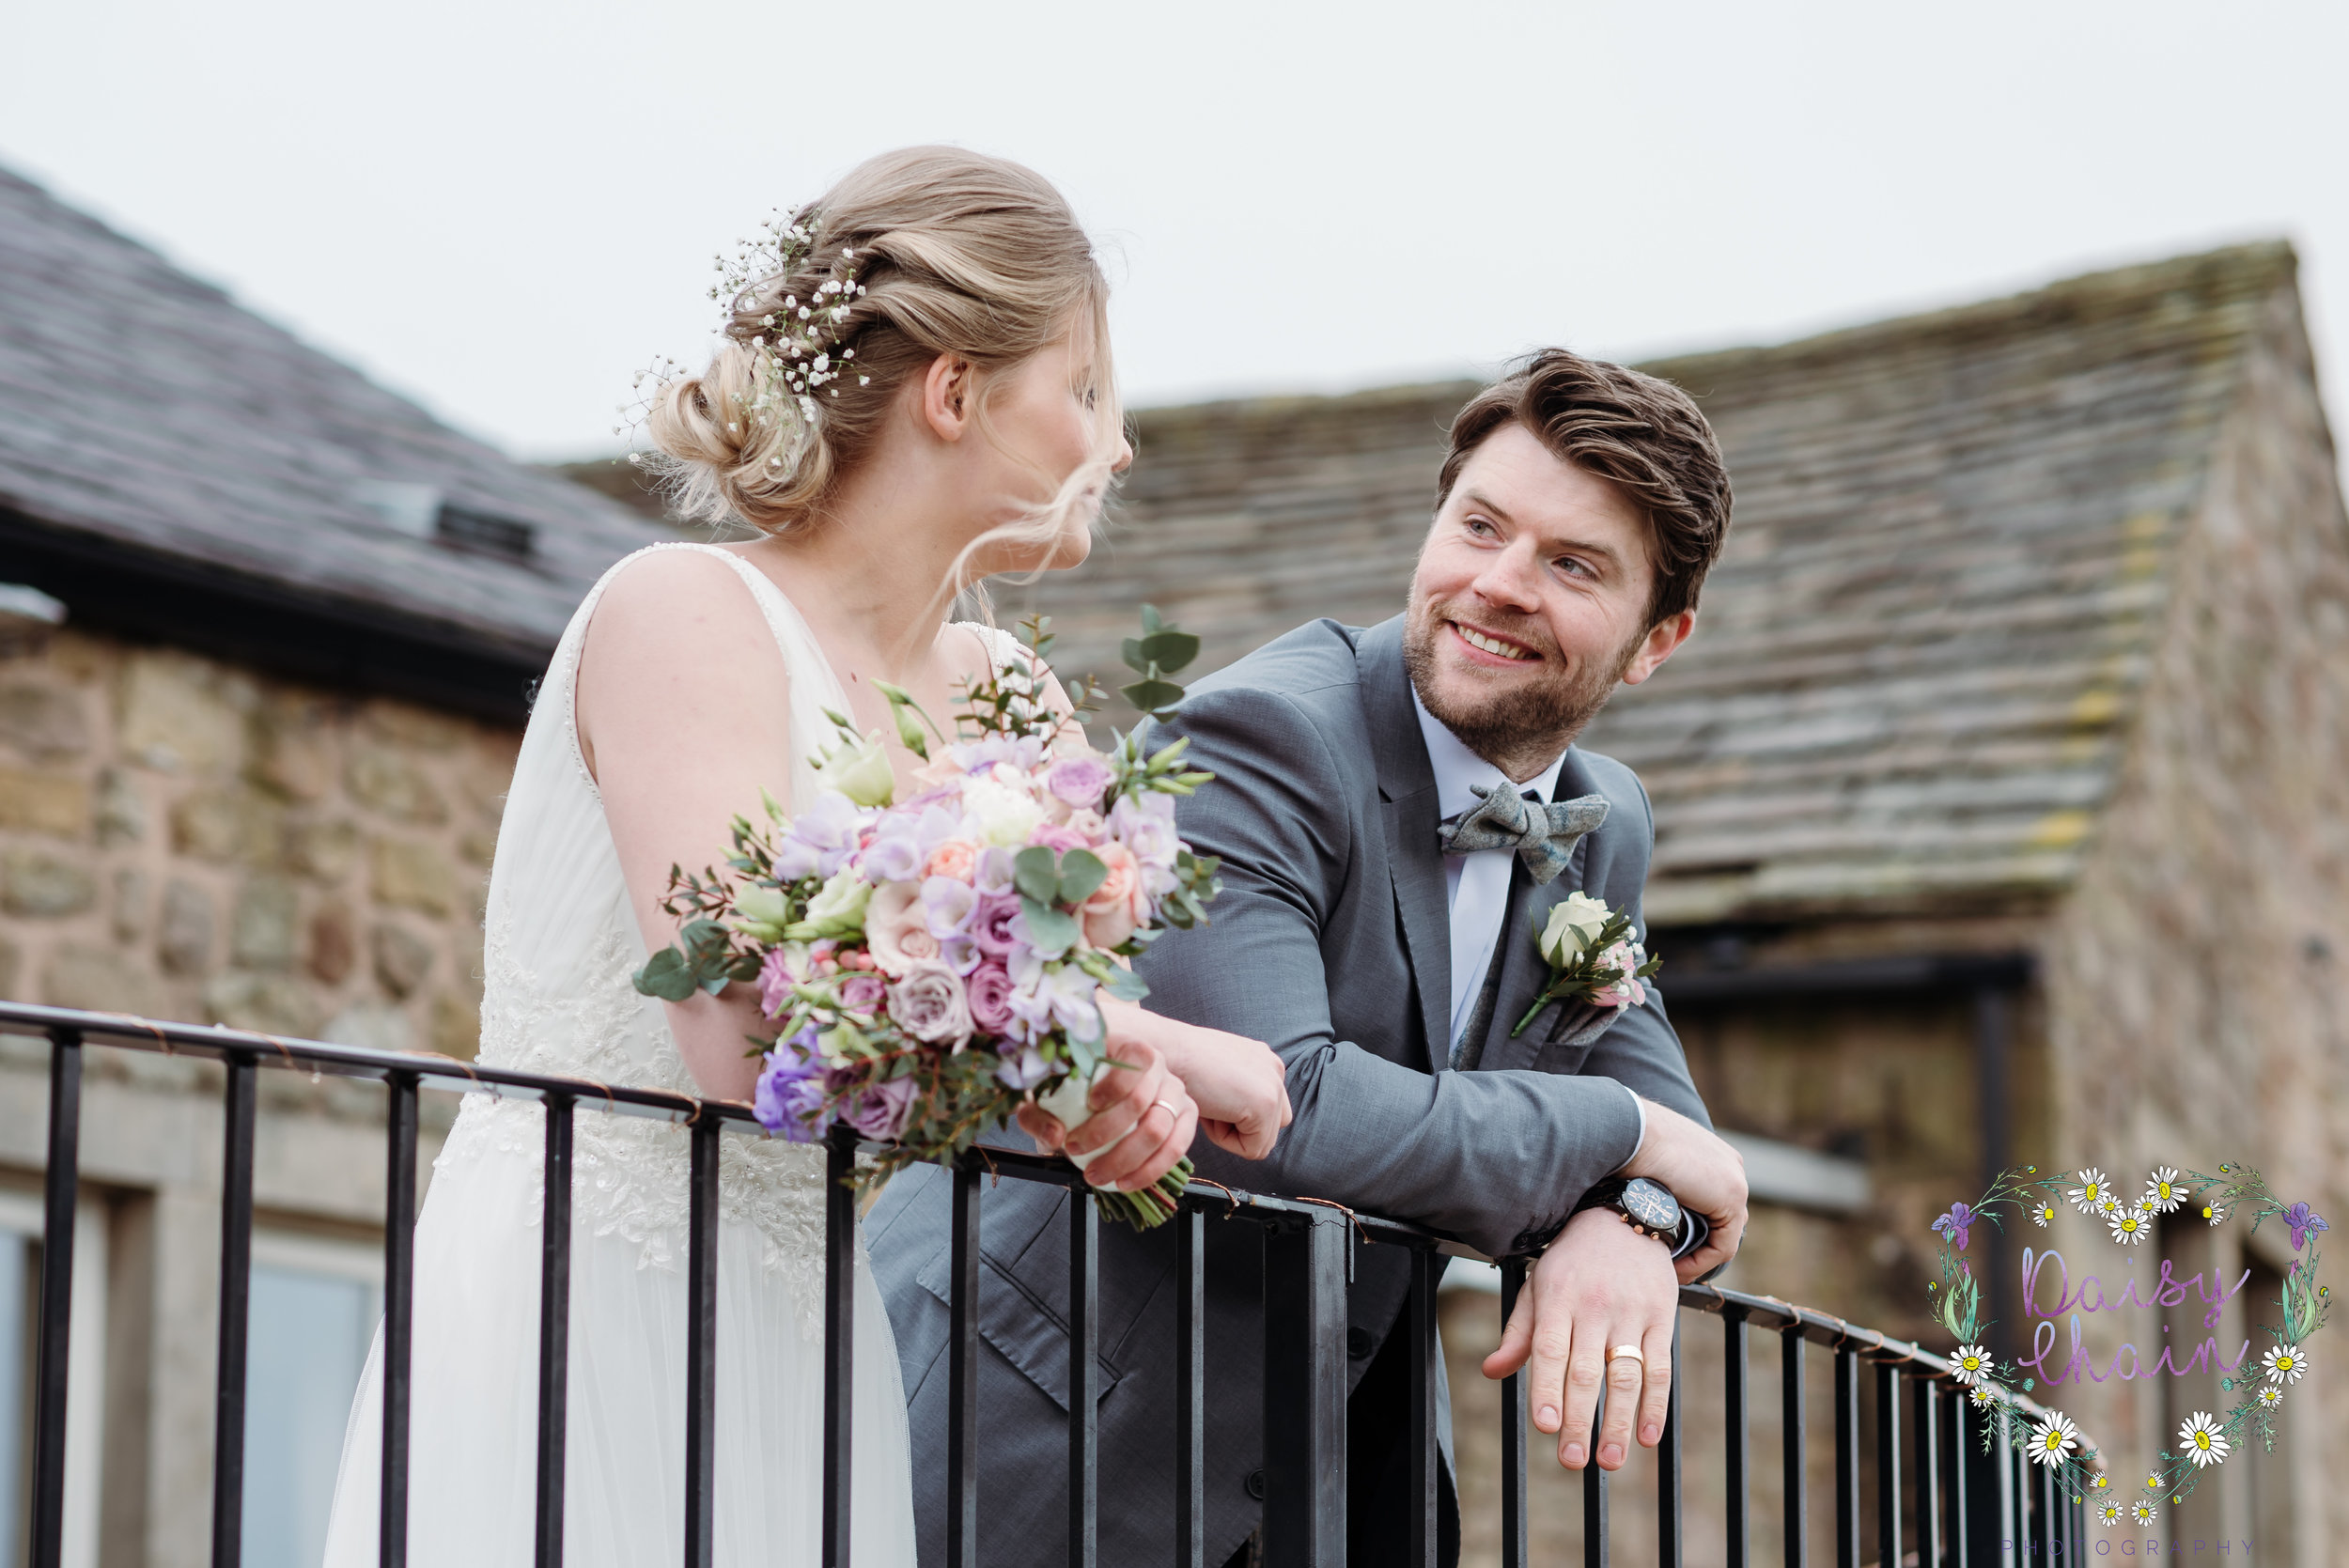 The Shireburn Arms, Ribble Valley wedding